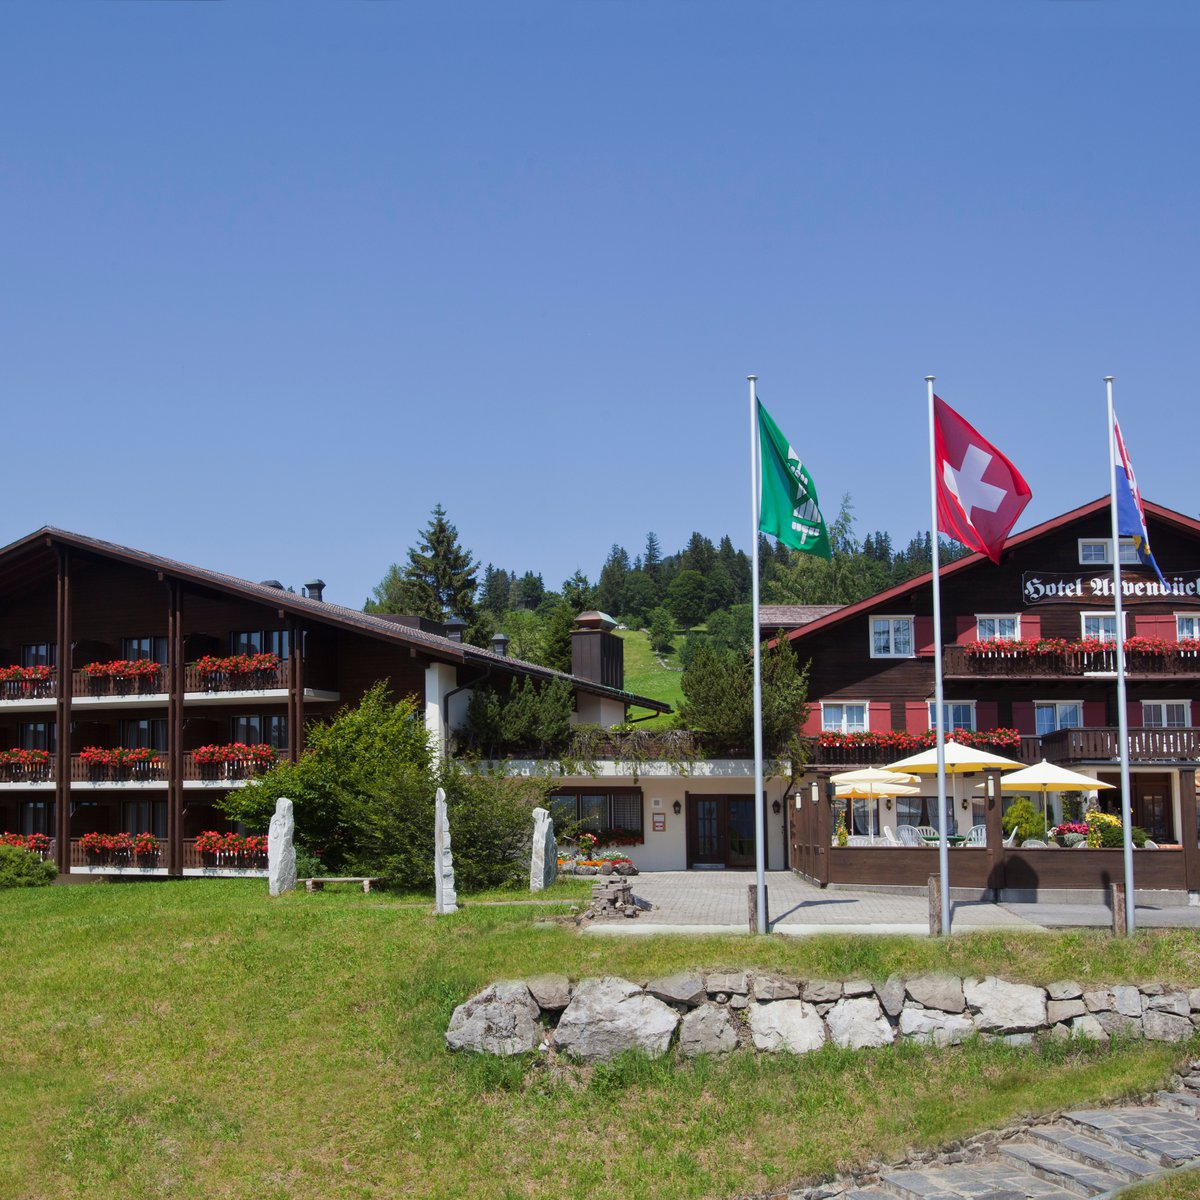 Hotel Restaurant Arvenbüel, Amden